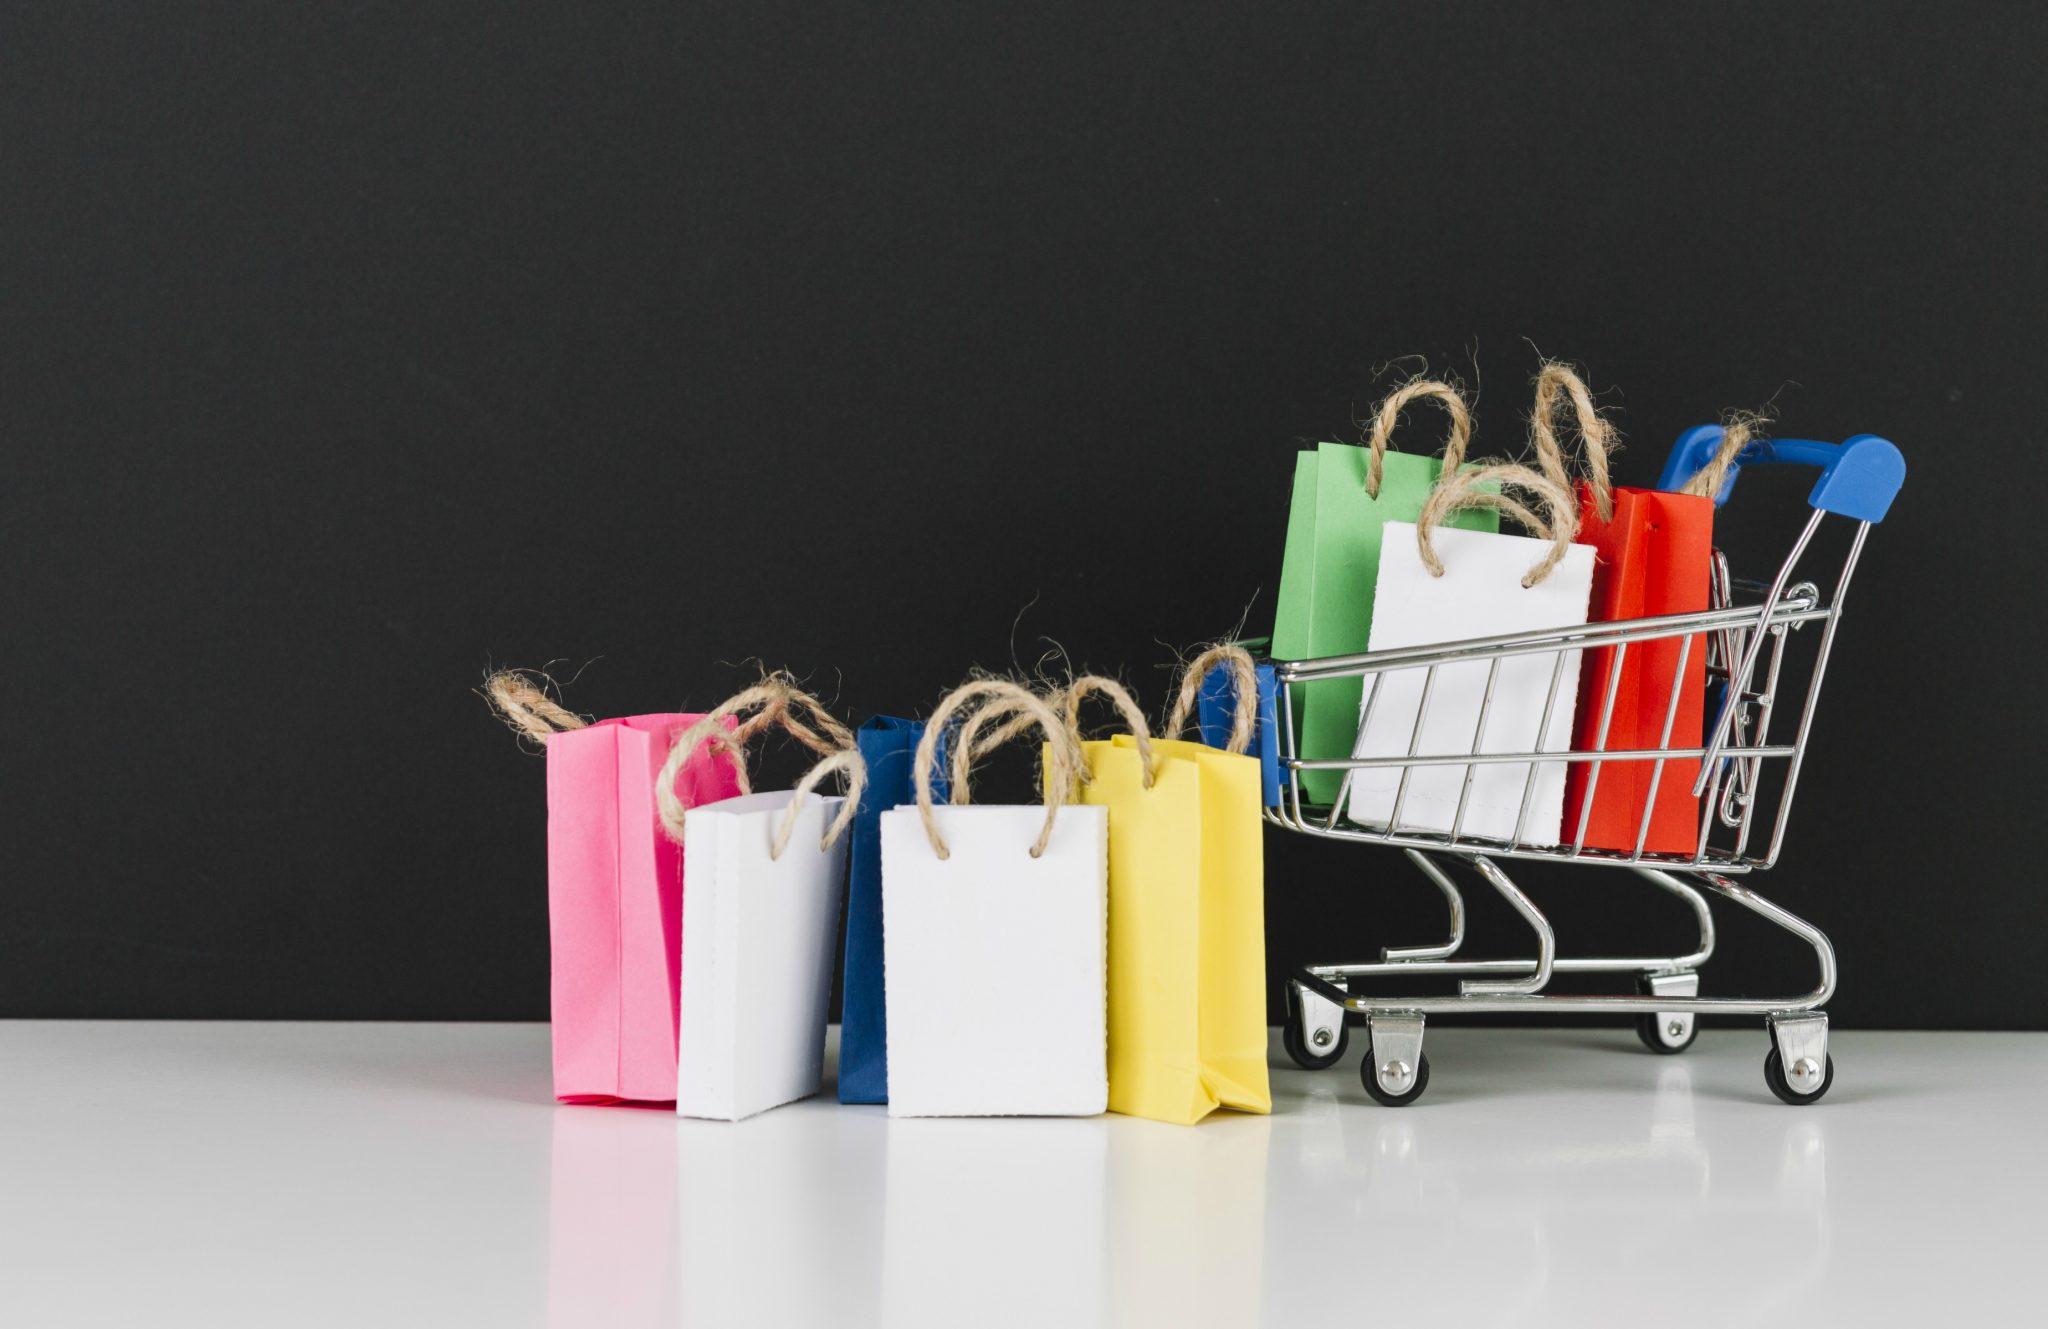 Comportamento de compra durante pandemia